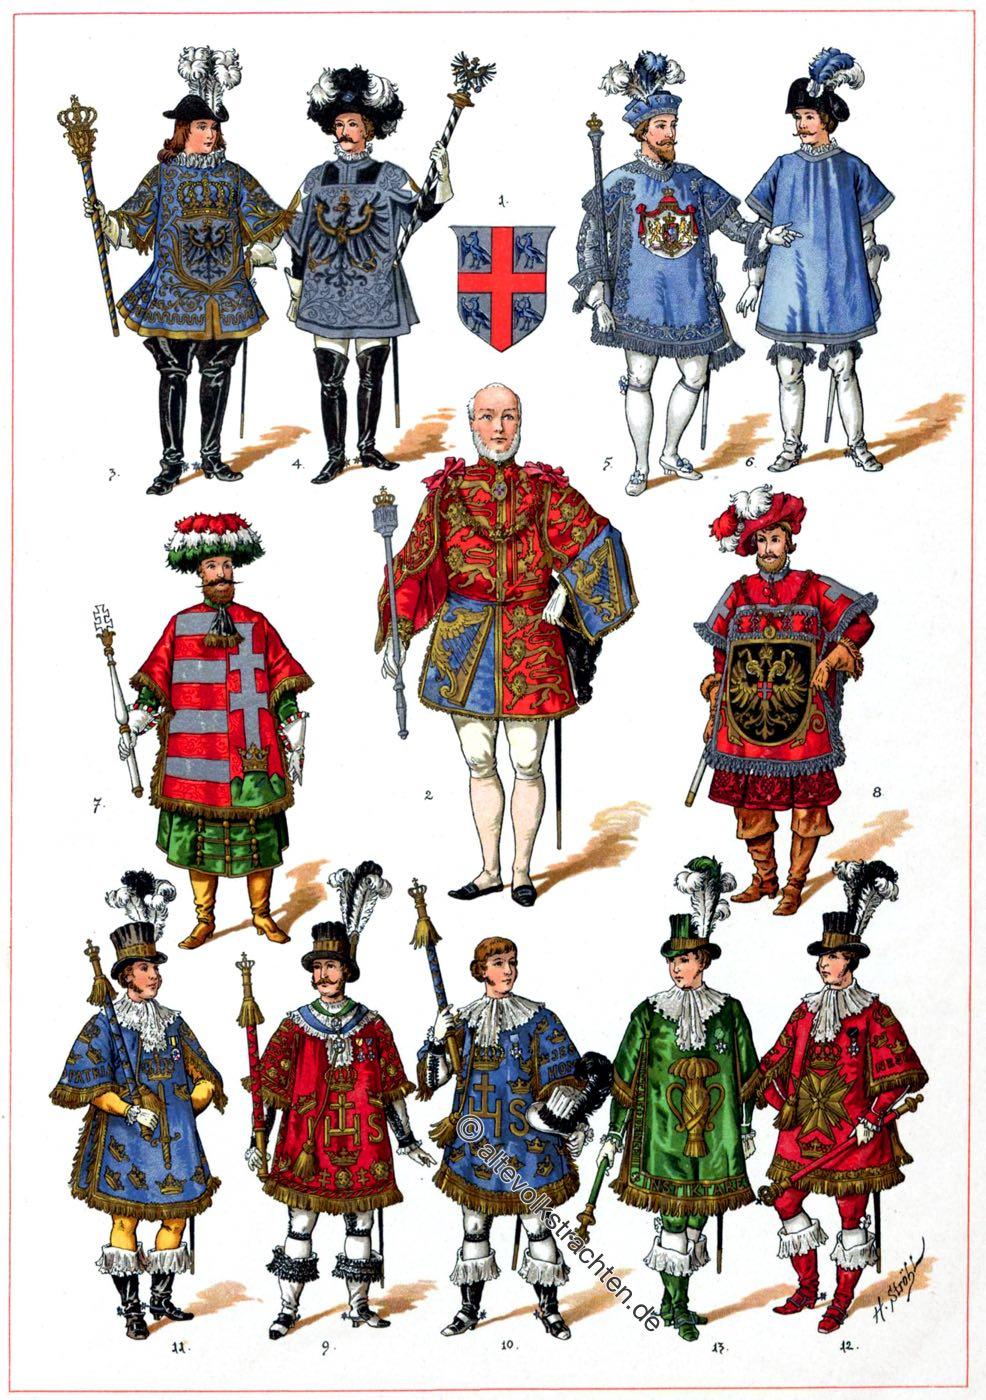 Herolde, Heralds, Wappen, Heraldik, Heroldswesen, Trachten, Mittelalter, Kostüme, Bekleidung, Tappert